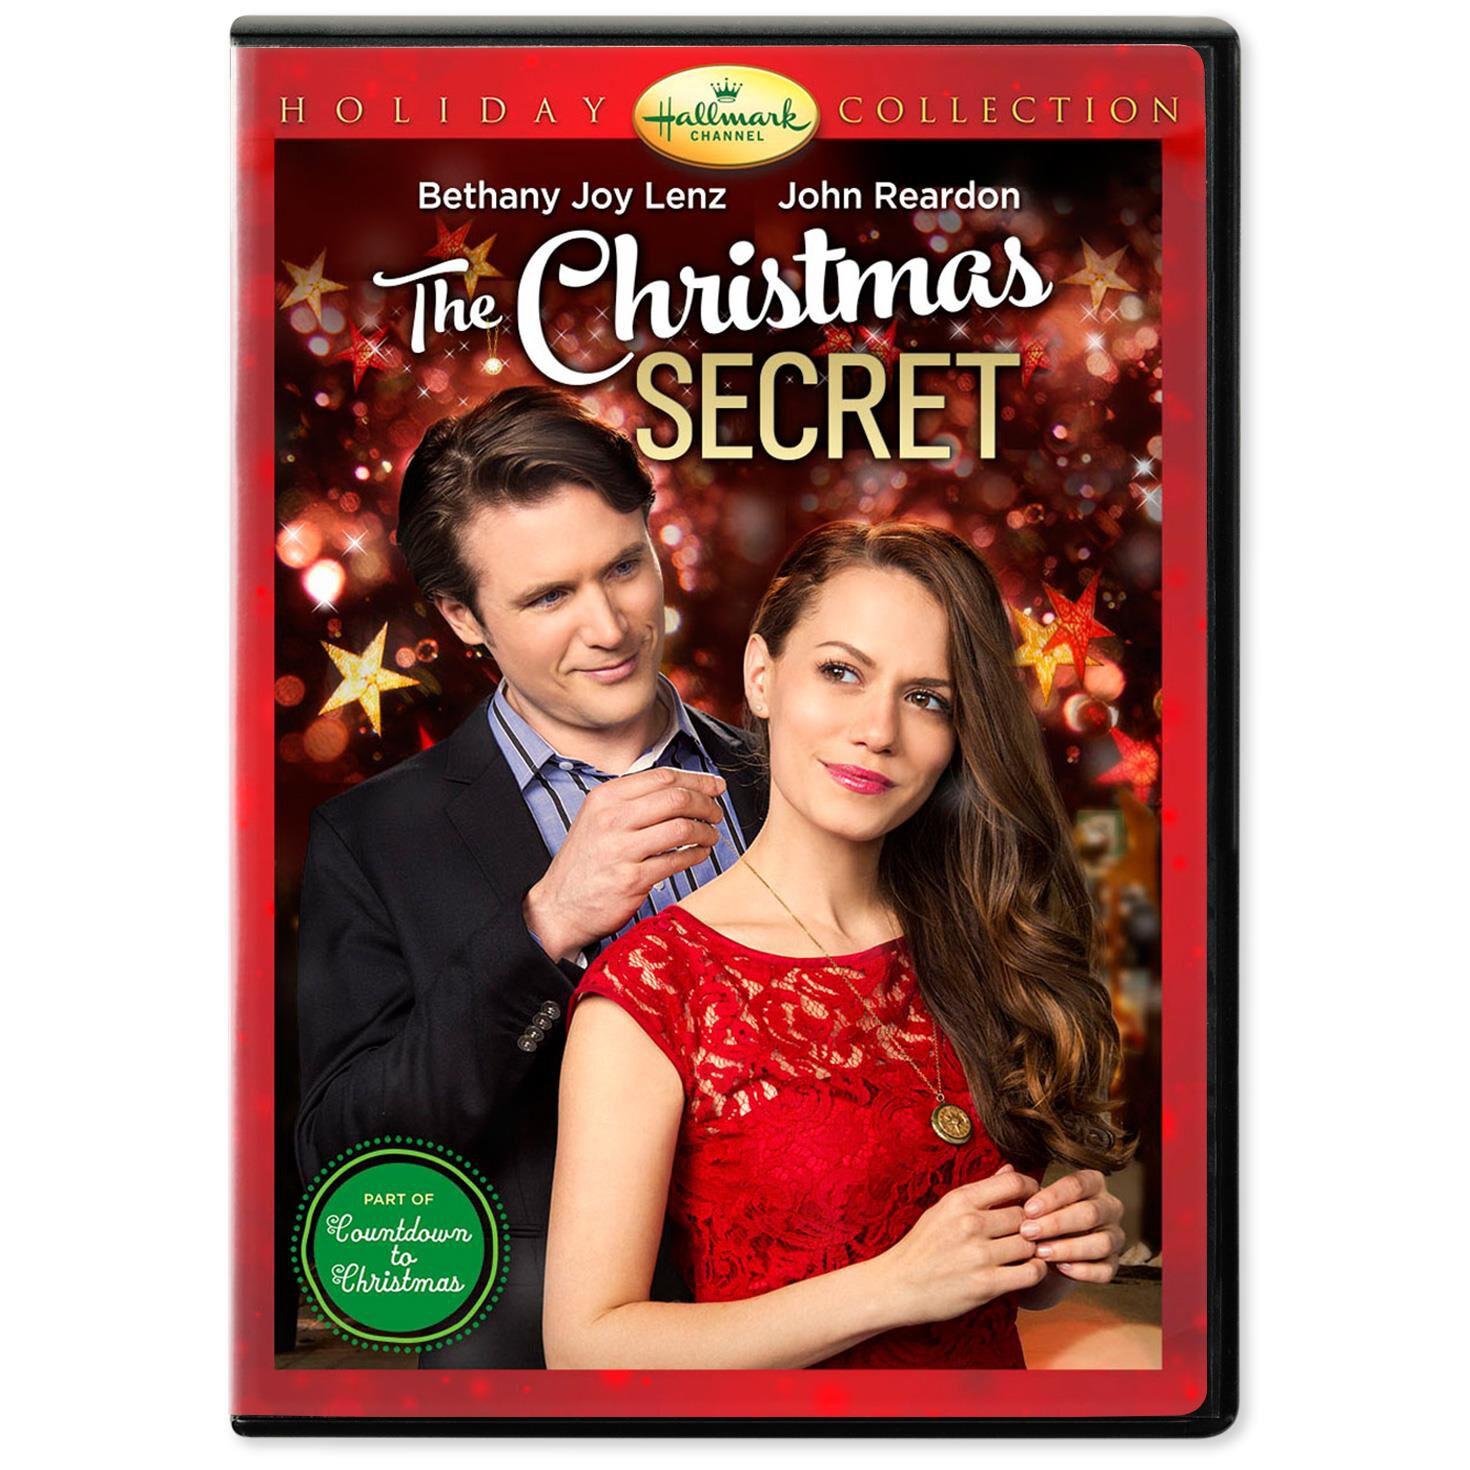 the christmas secret dvd hallmark channel hallmark - The Christmas Secret Dvd